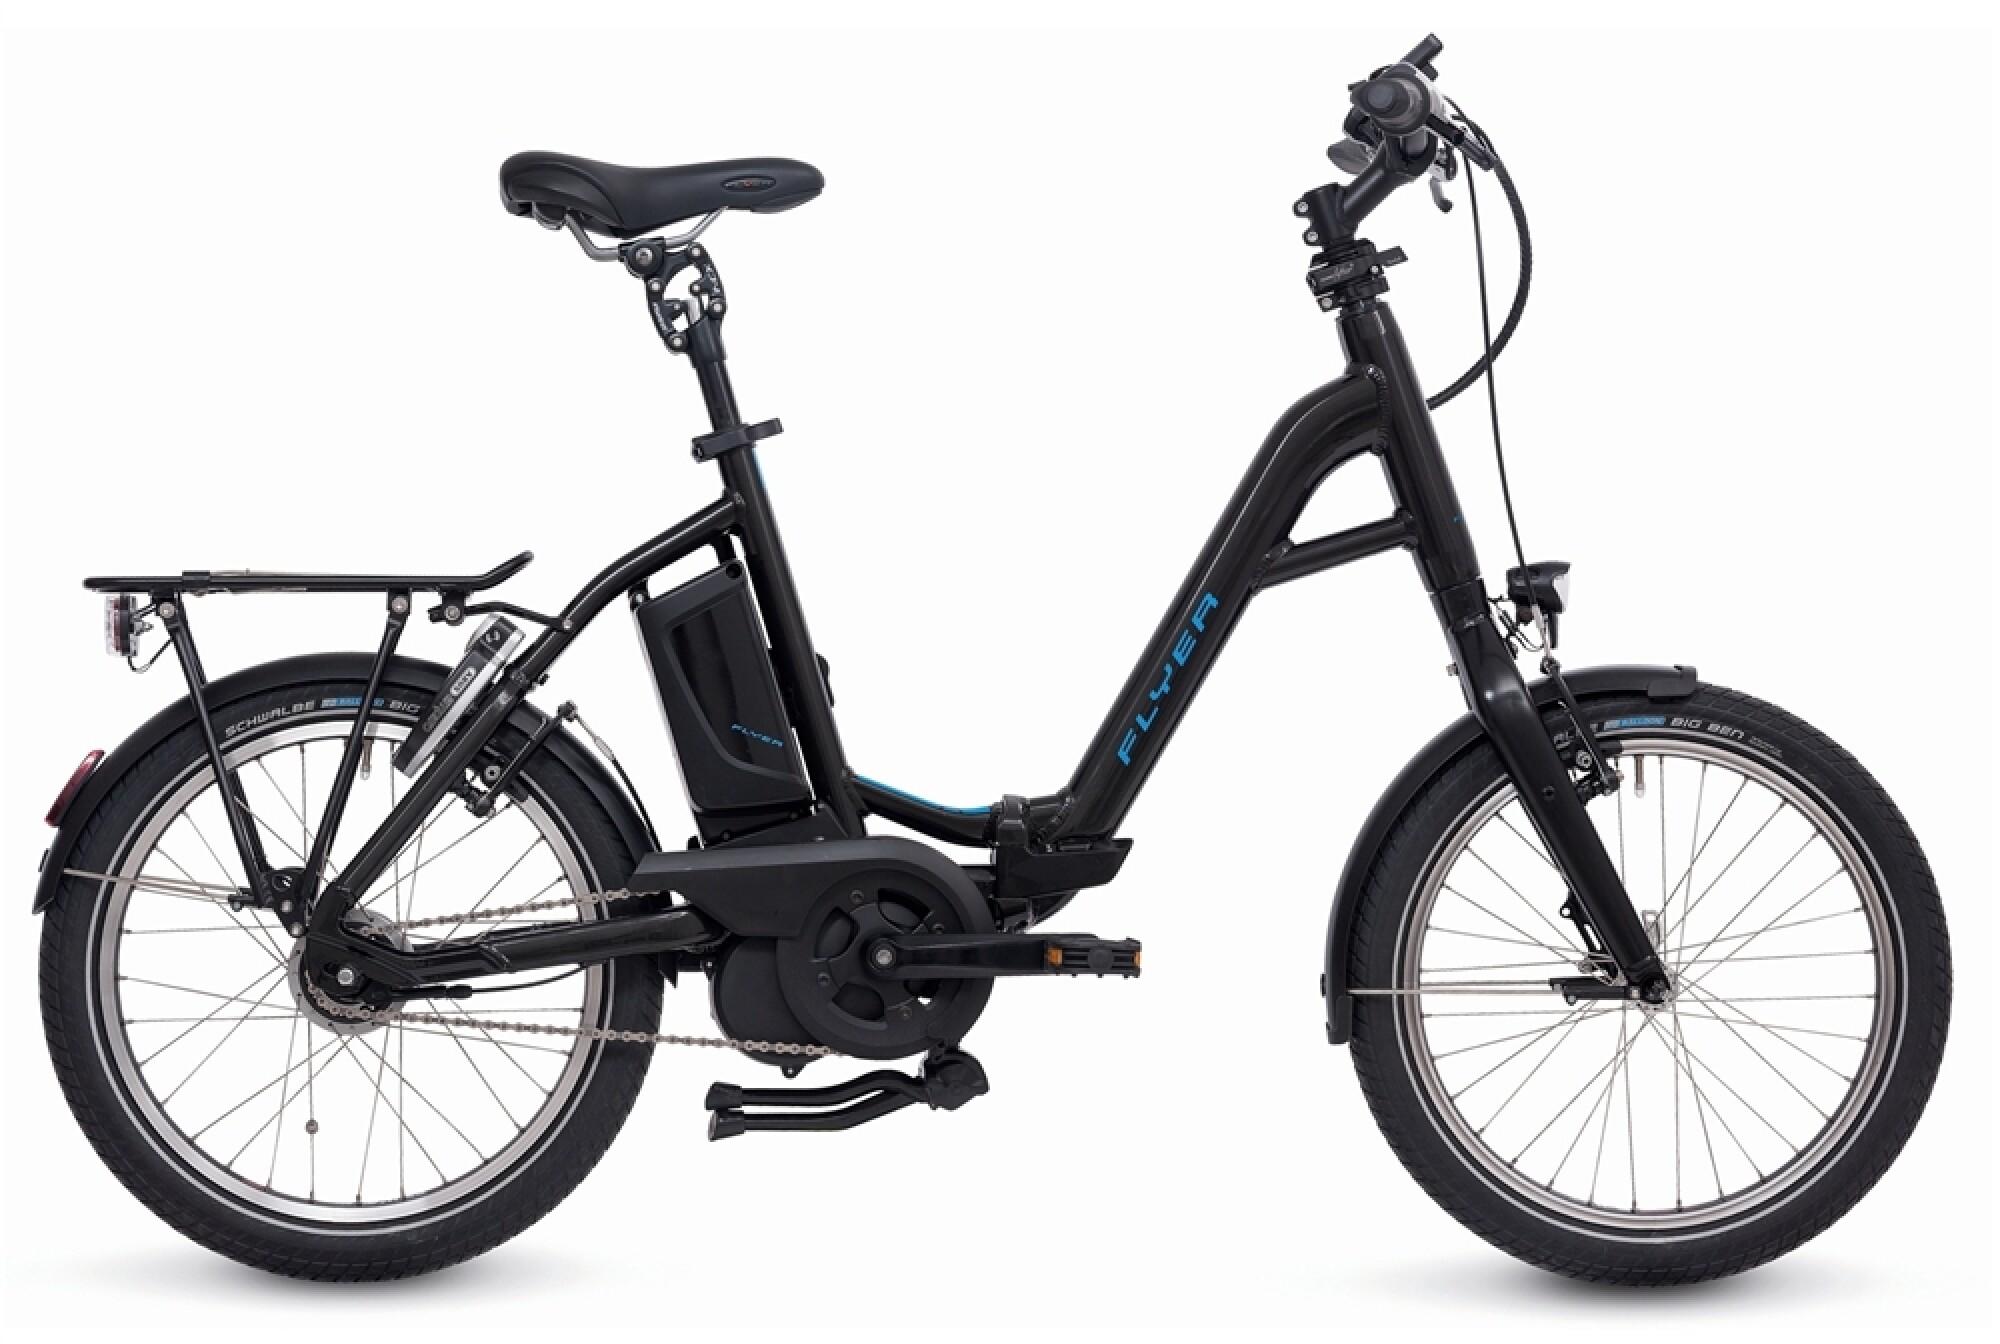 e bike flyer pluto 2017 bei alle details und. Black Bedroom Furniture Sets. Home Design Ideas